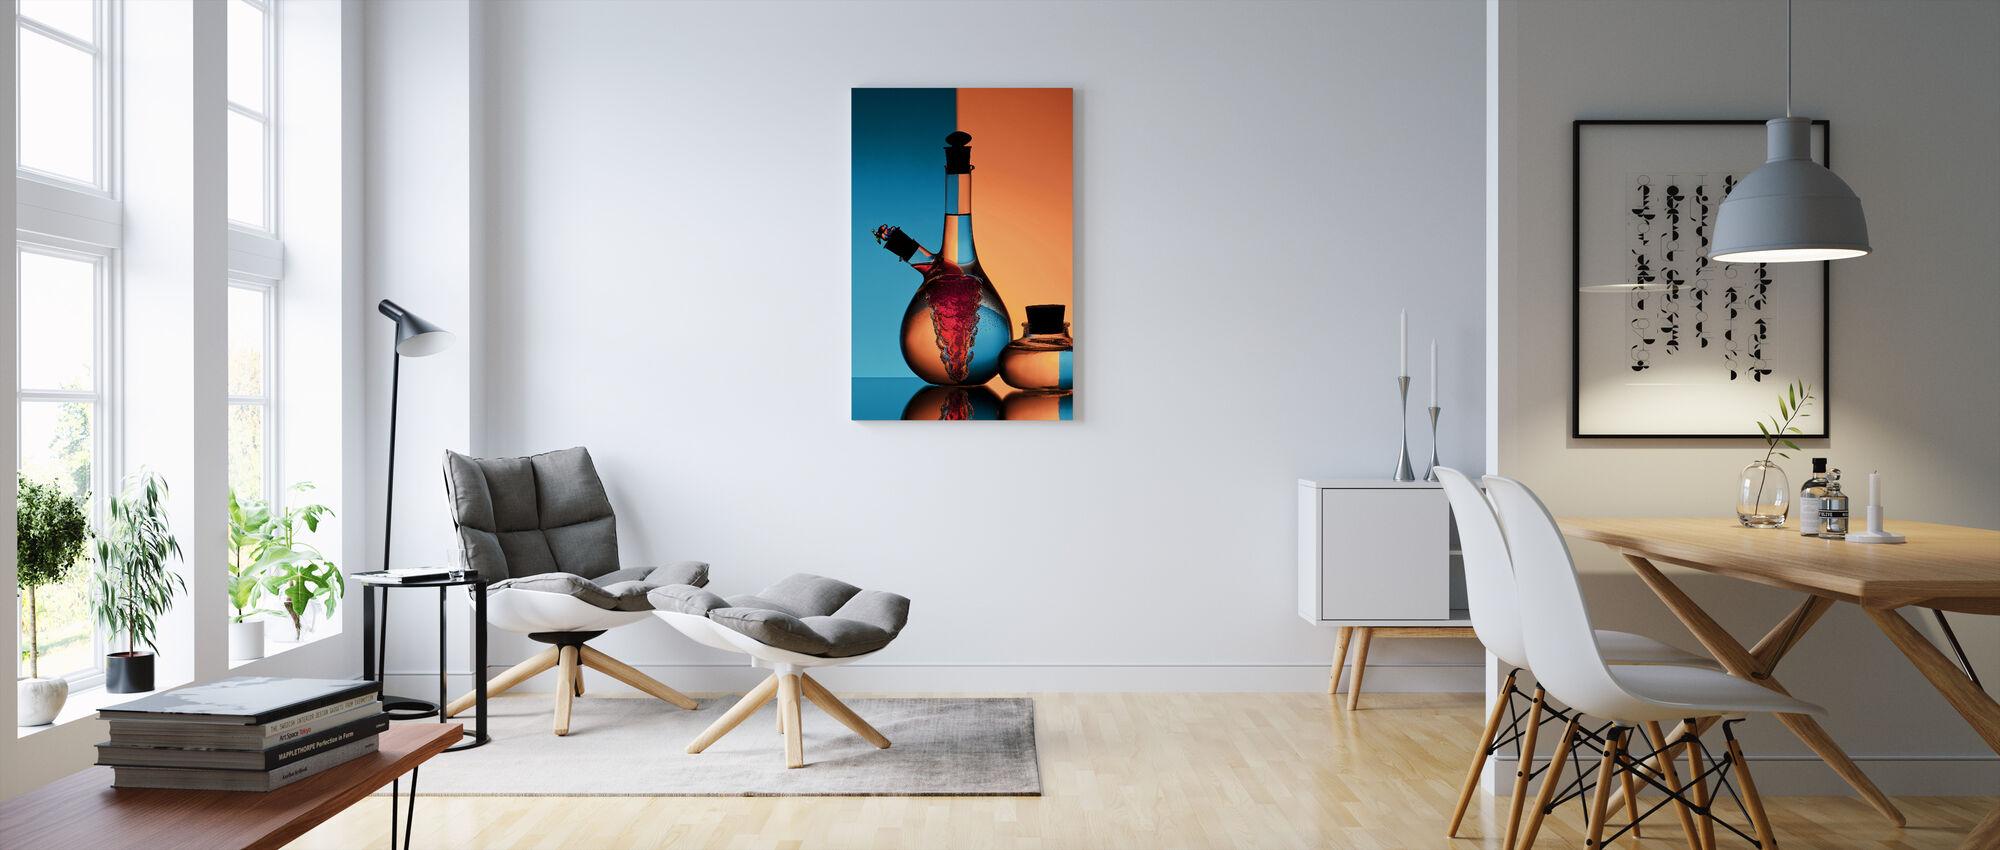 Oil & Vinegar - Canvas print - Living Room